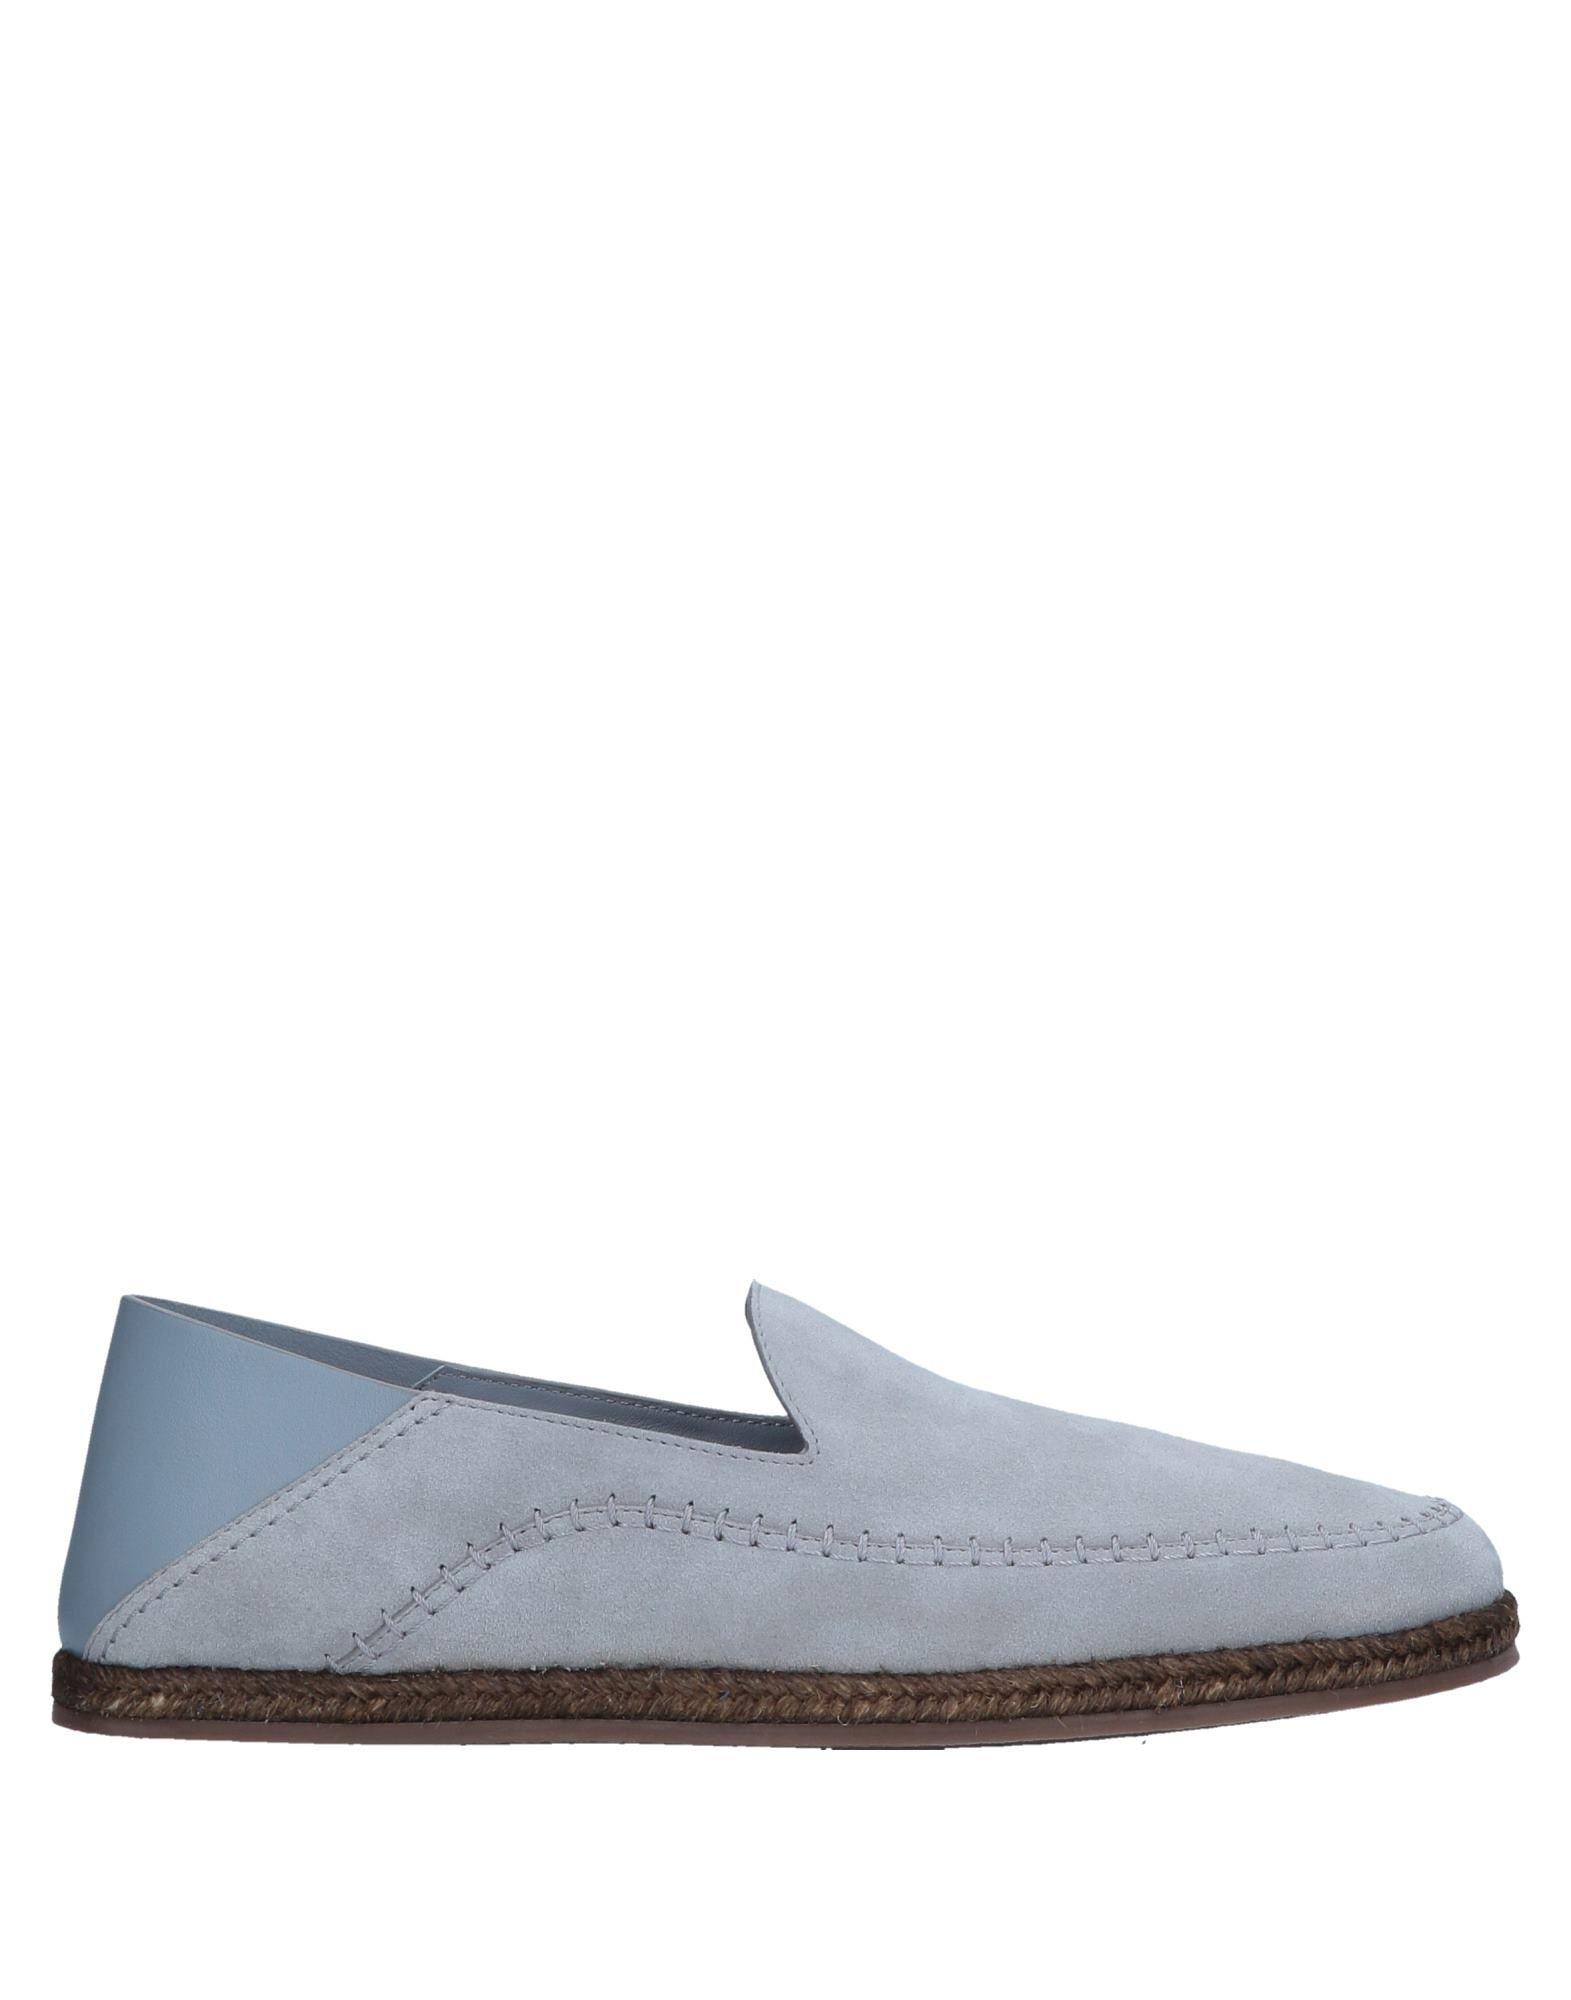 Ermenegildo Zegna Mokassins Herren  11551988AB Gute Qualität beliebte Schuhe